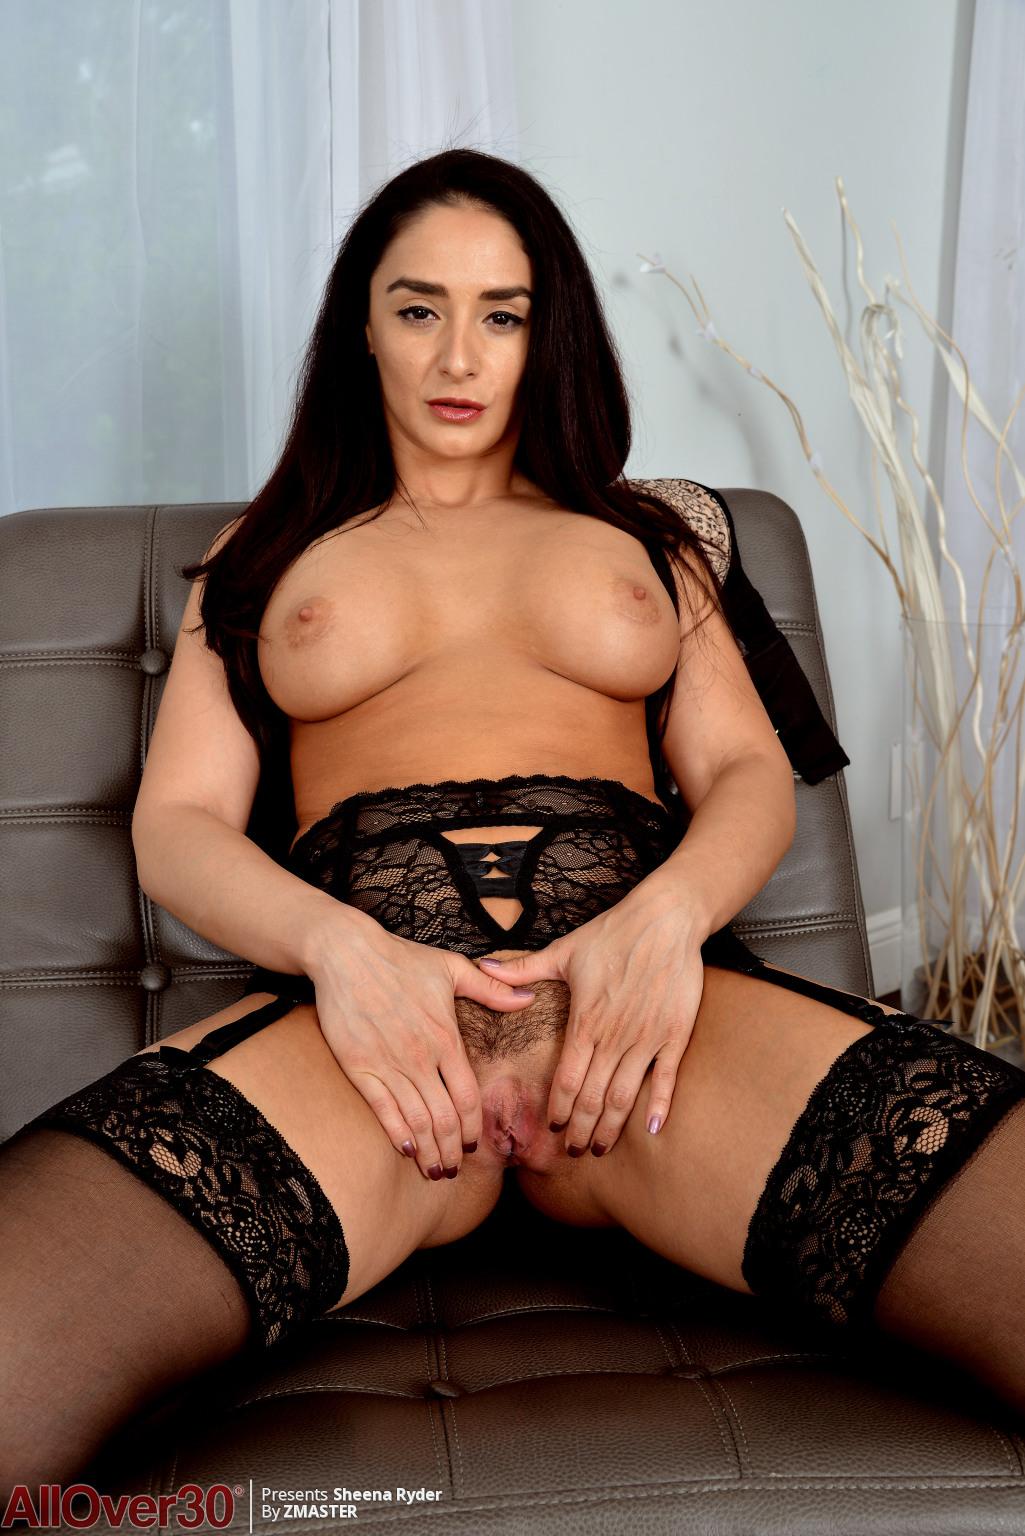 big-tits-beauty-sheena-ryder-13